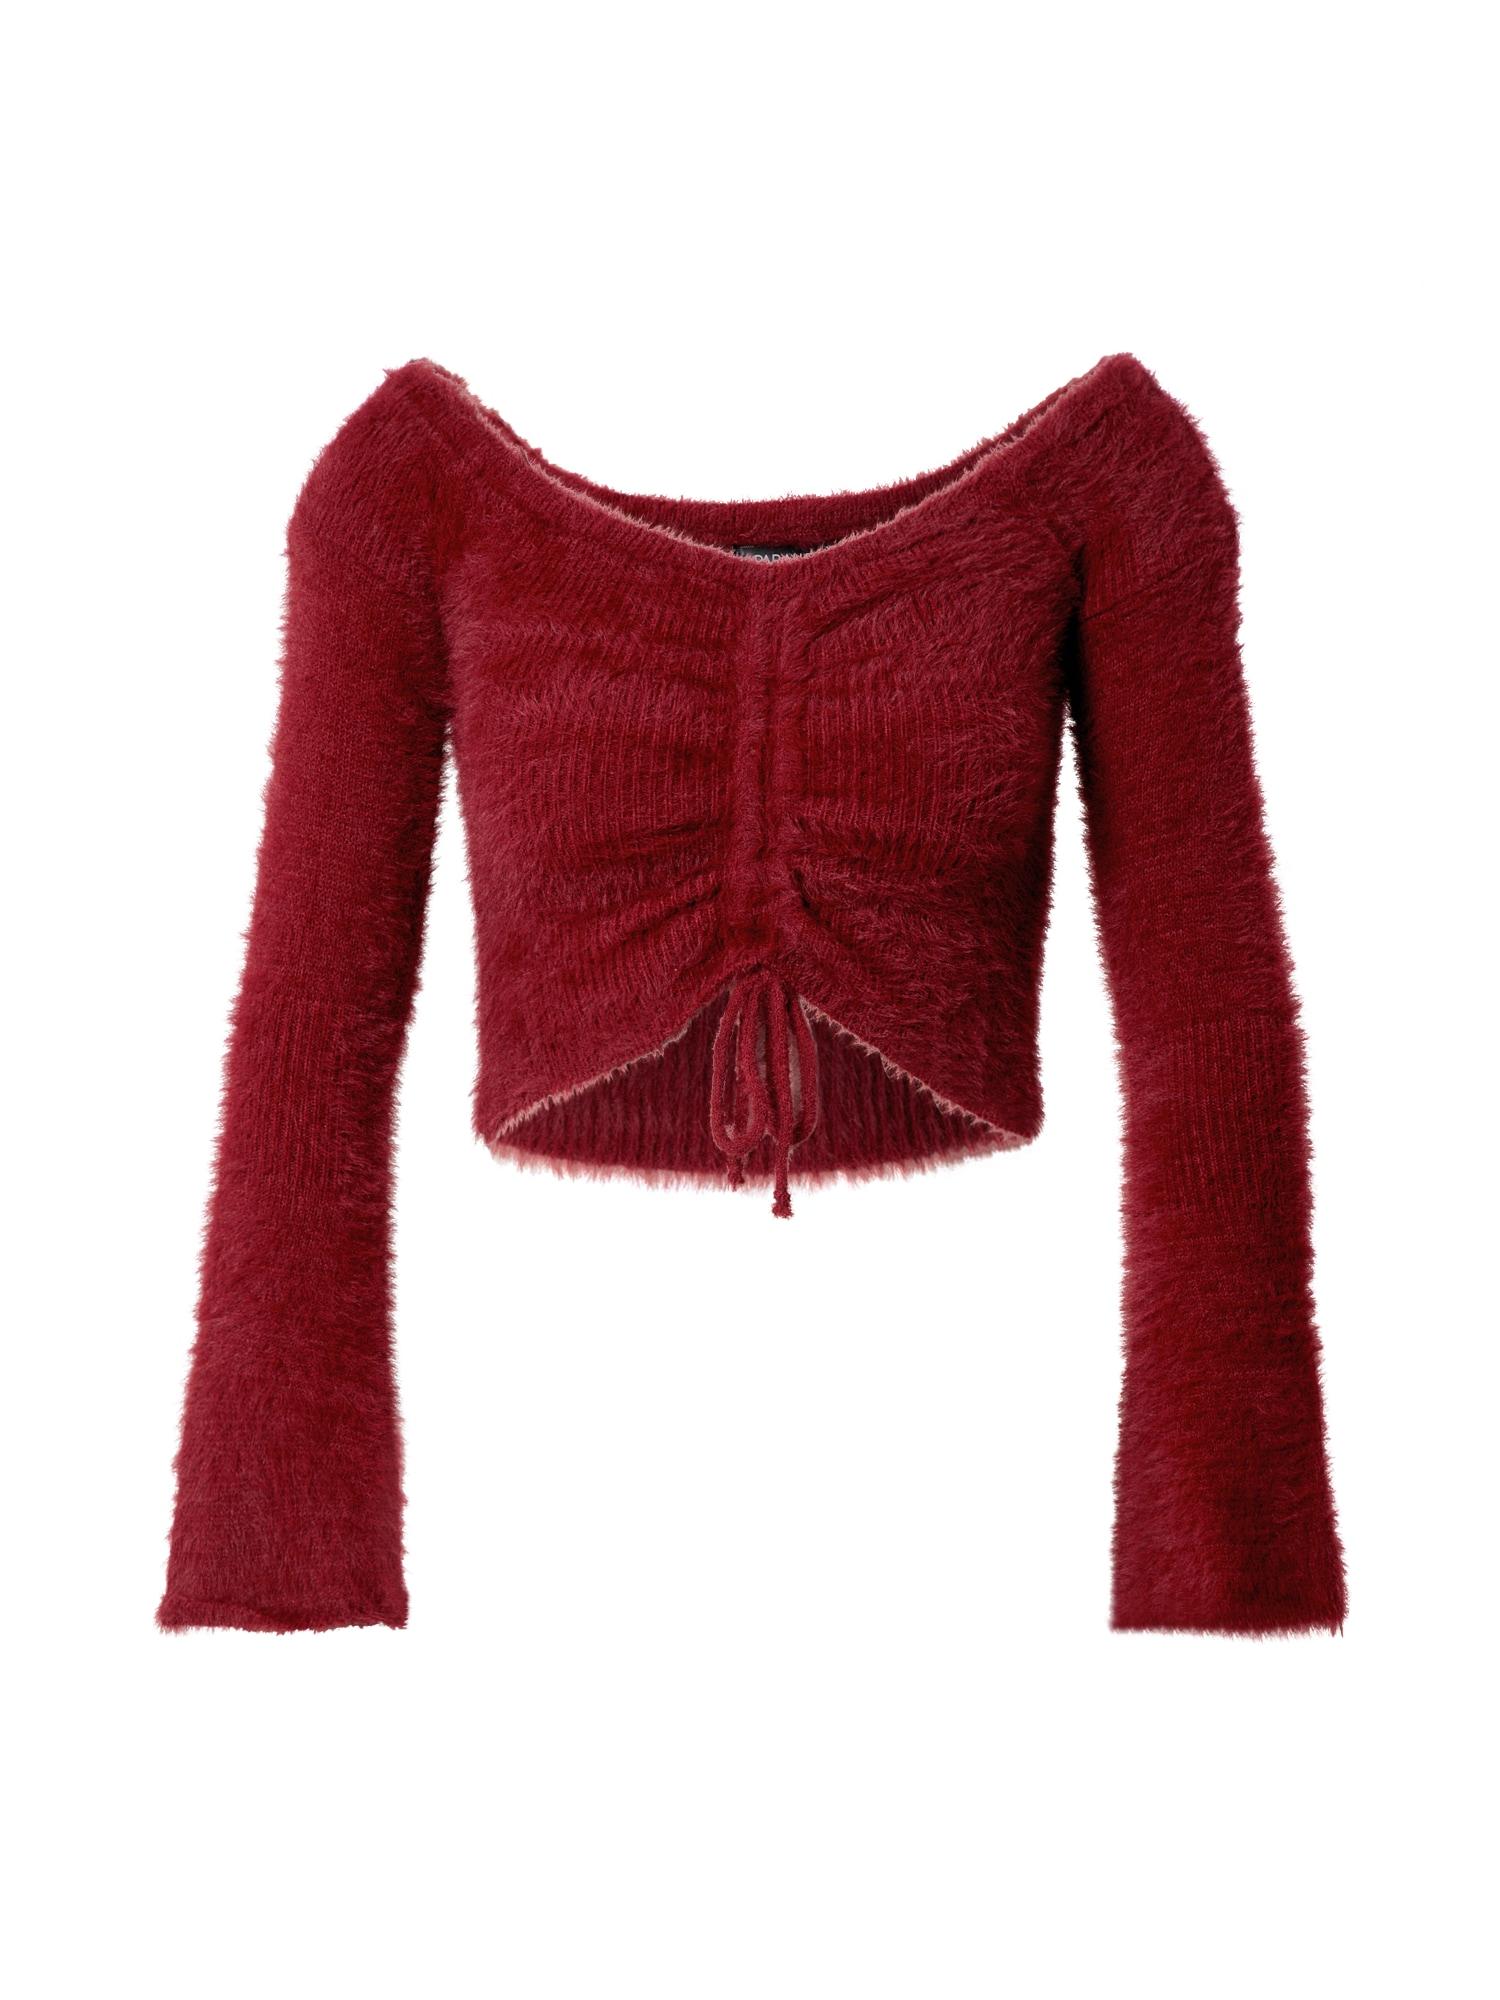 Parallel Lines Megztinis raudona